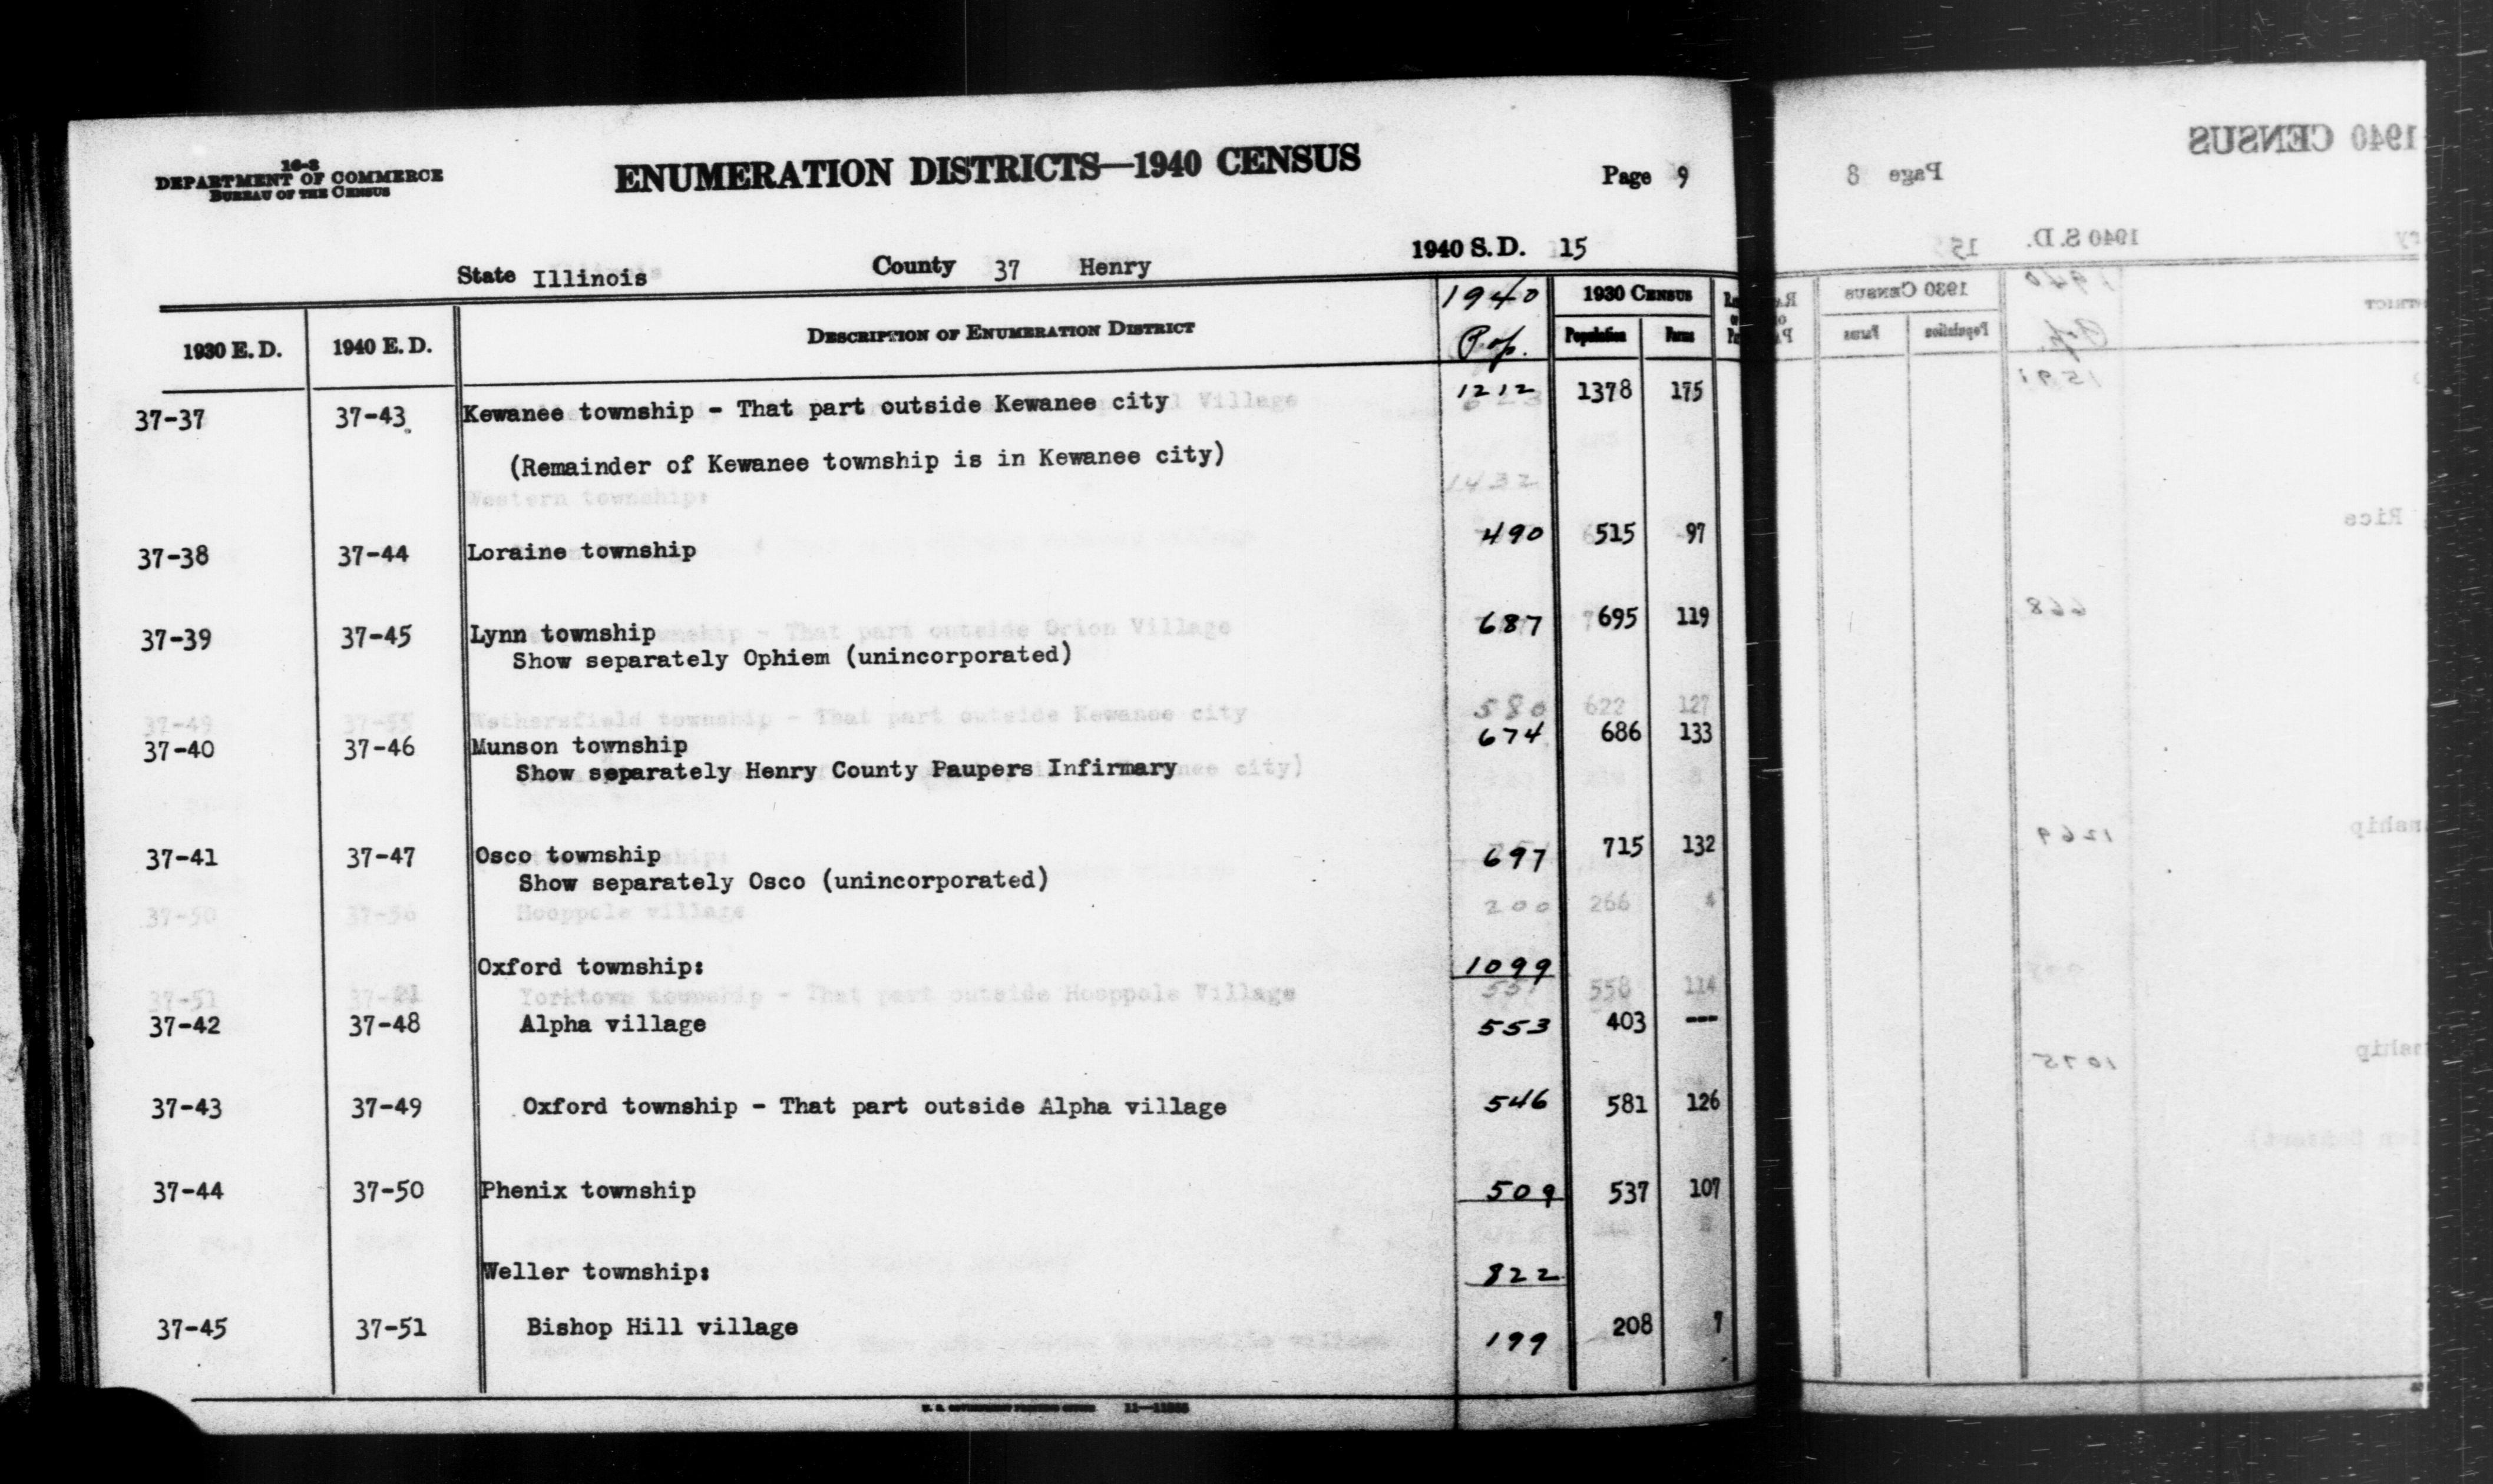 1940 Census Enumeration District Descriptions - Illinois - Henry County - ED 37-43, ED 37-44, ED 37-45, ED 37-46, ED 37-47, ED 37-48, ED 37-49, ED 37-50, ED 37-51